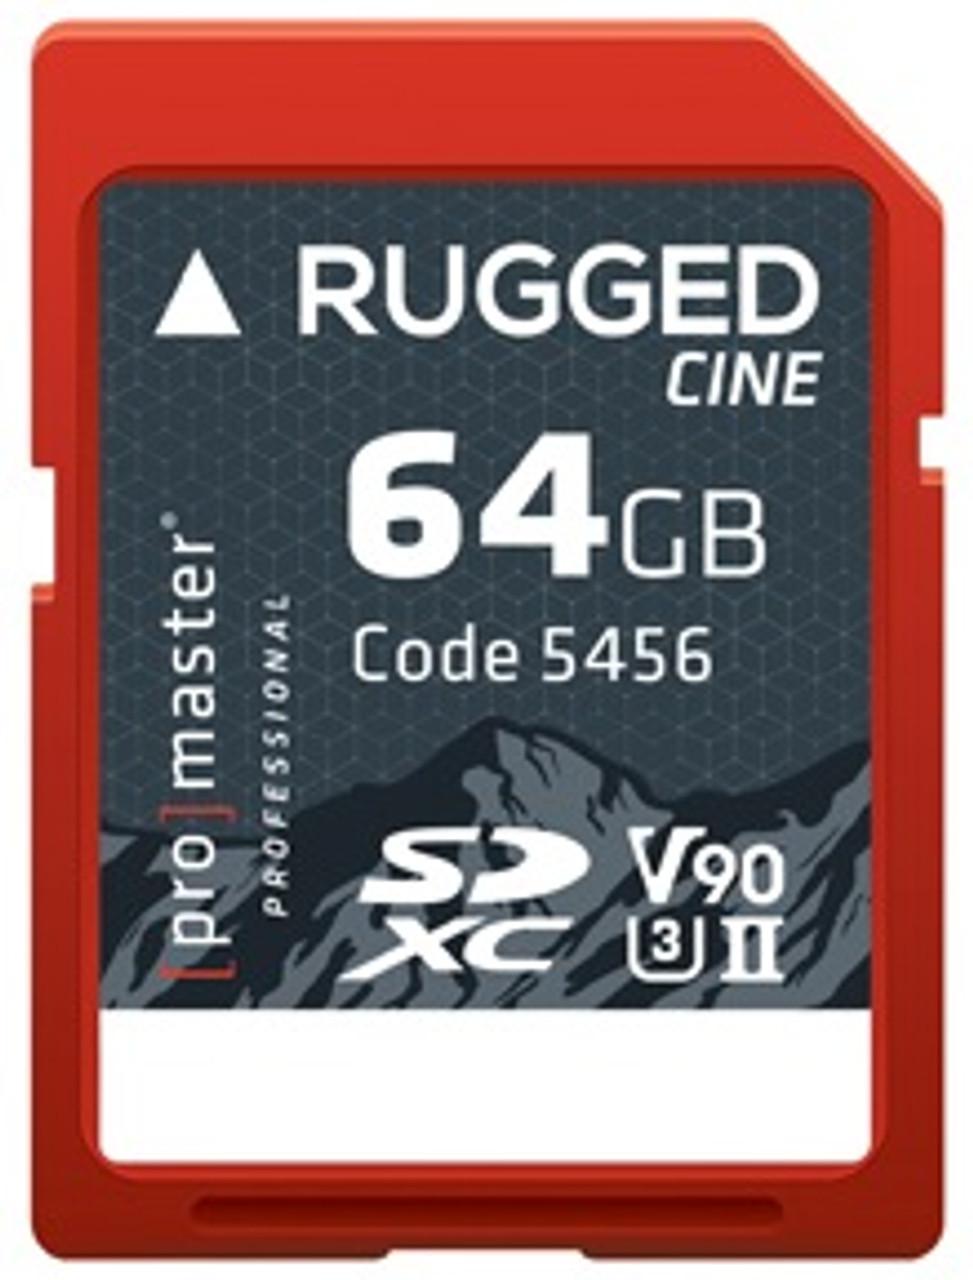 ProMaster 64GB SDXC Rugged CINE UHS-II